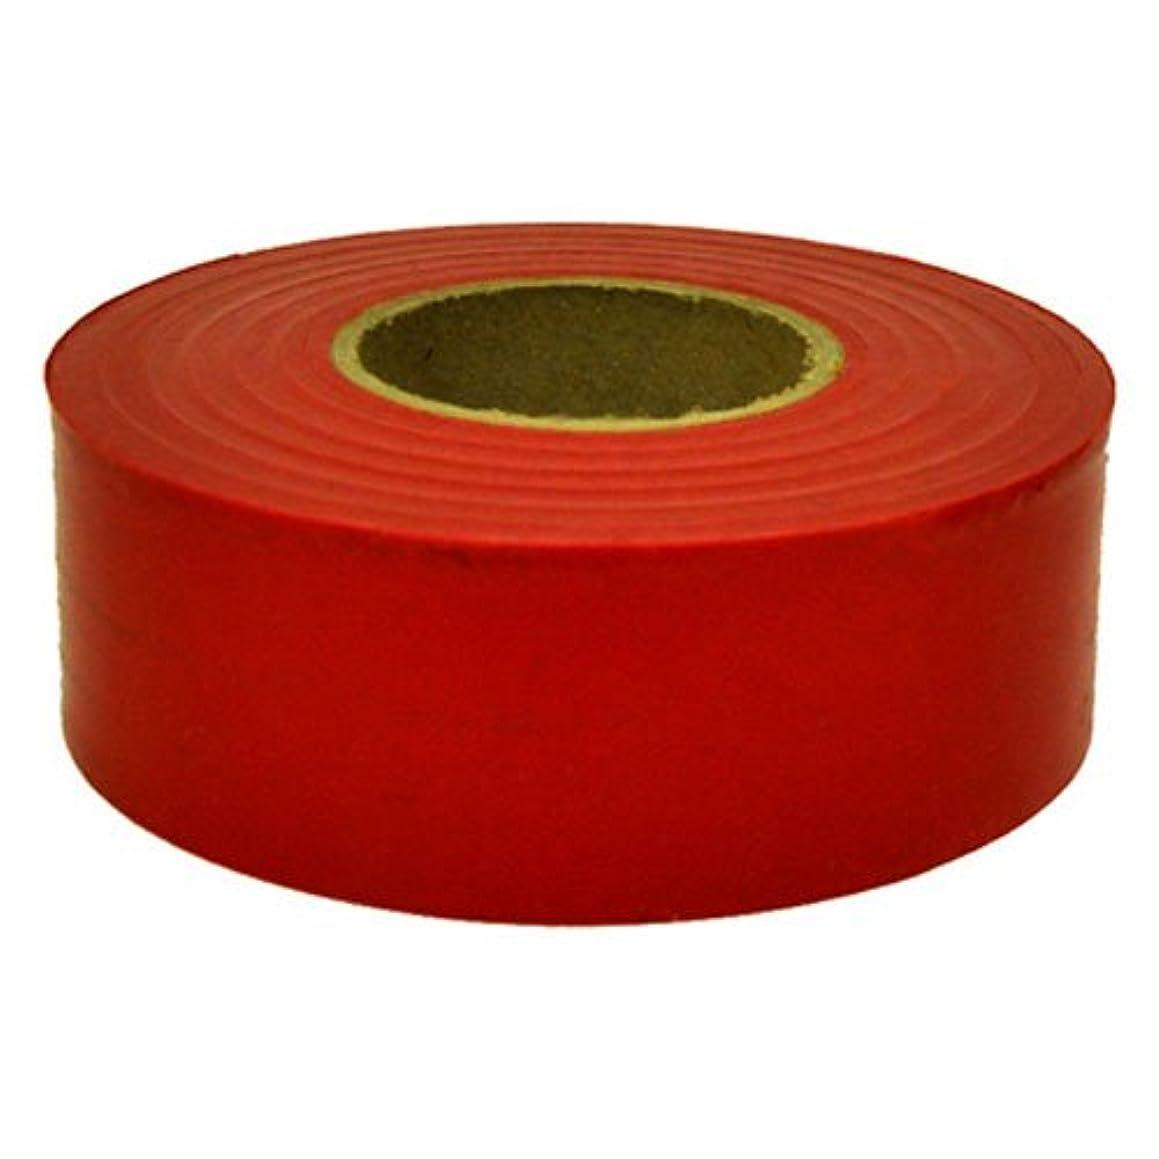 Hanson C H 17021 CO 300' RED Flag Tape